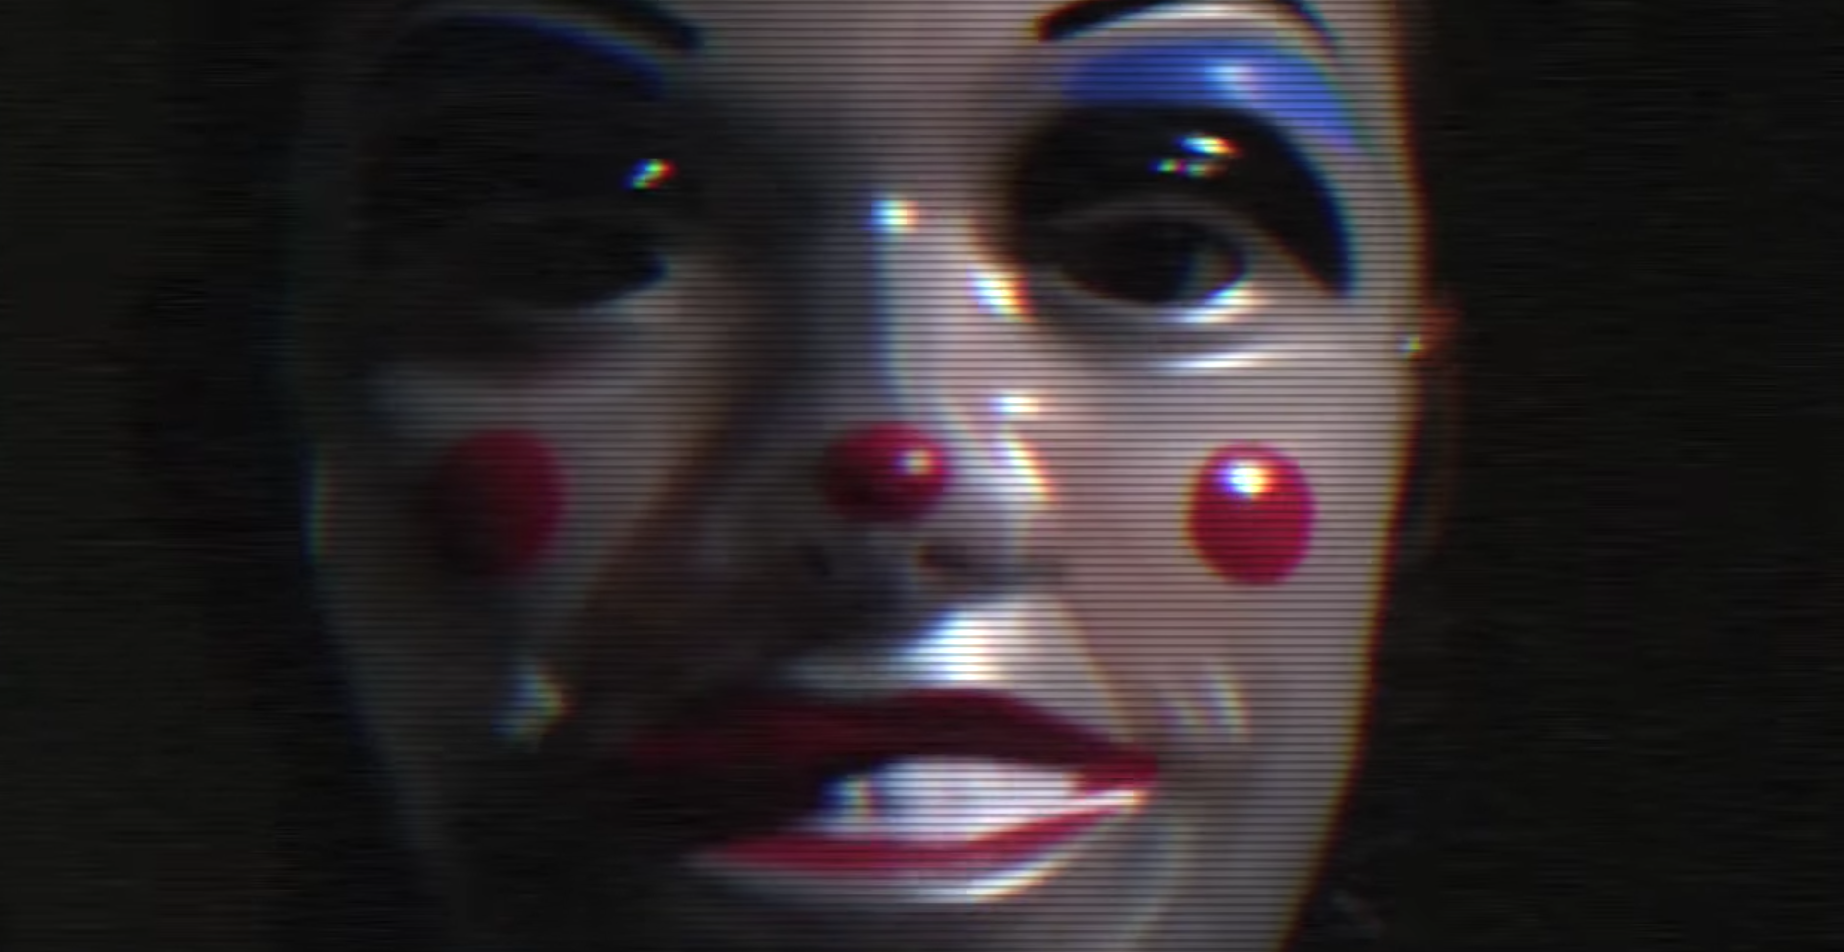 BLNCD BRKFST halloween promo + show narration